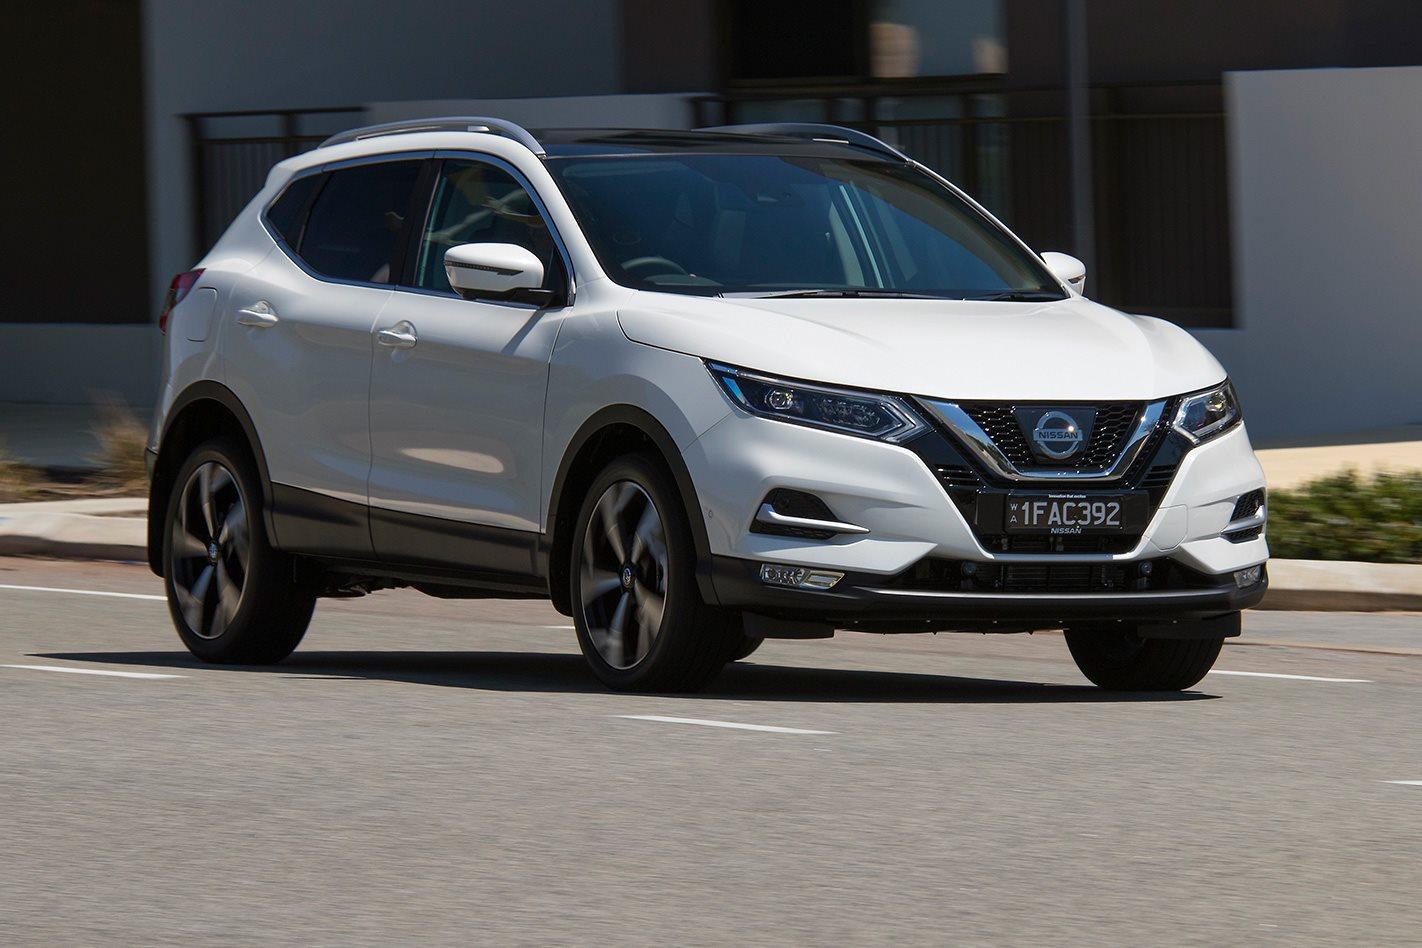 2018 Nissan Qashqai Quick Review